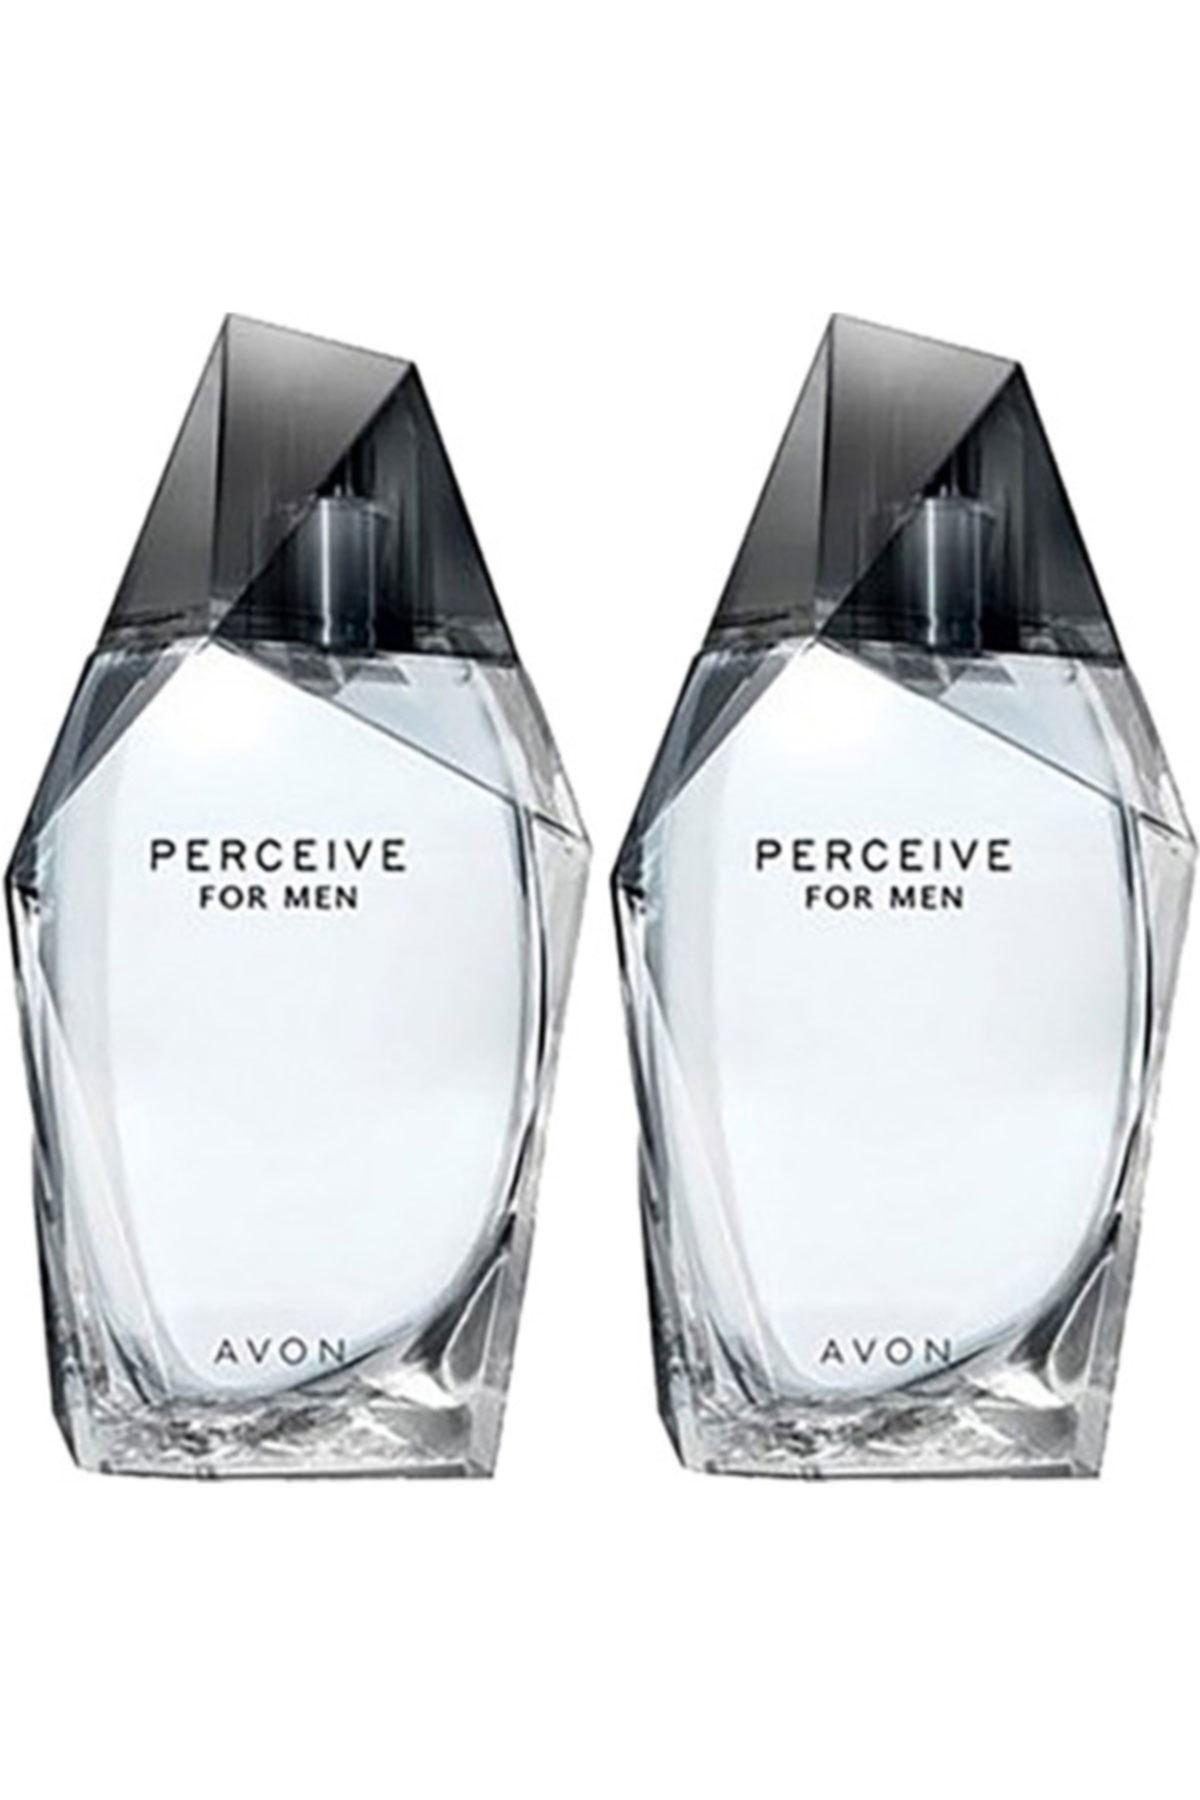 AVON Perceive Edt 100 ml. Erkek Parfüm -2 Adet 1